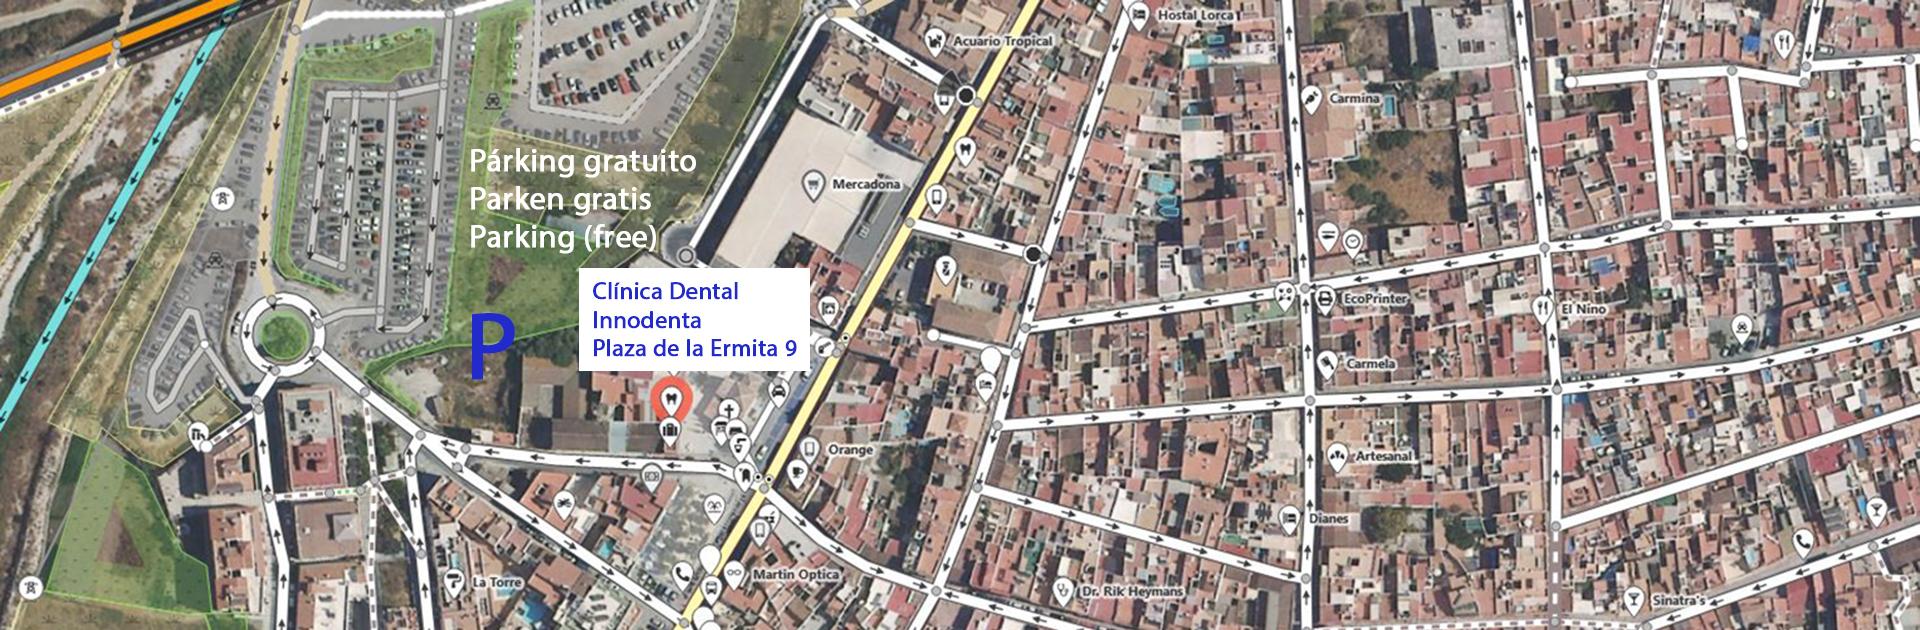 Satellitenfoto 'Clinica Dental Innodenta' in Nerja